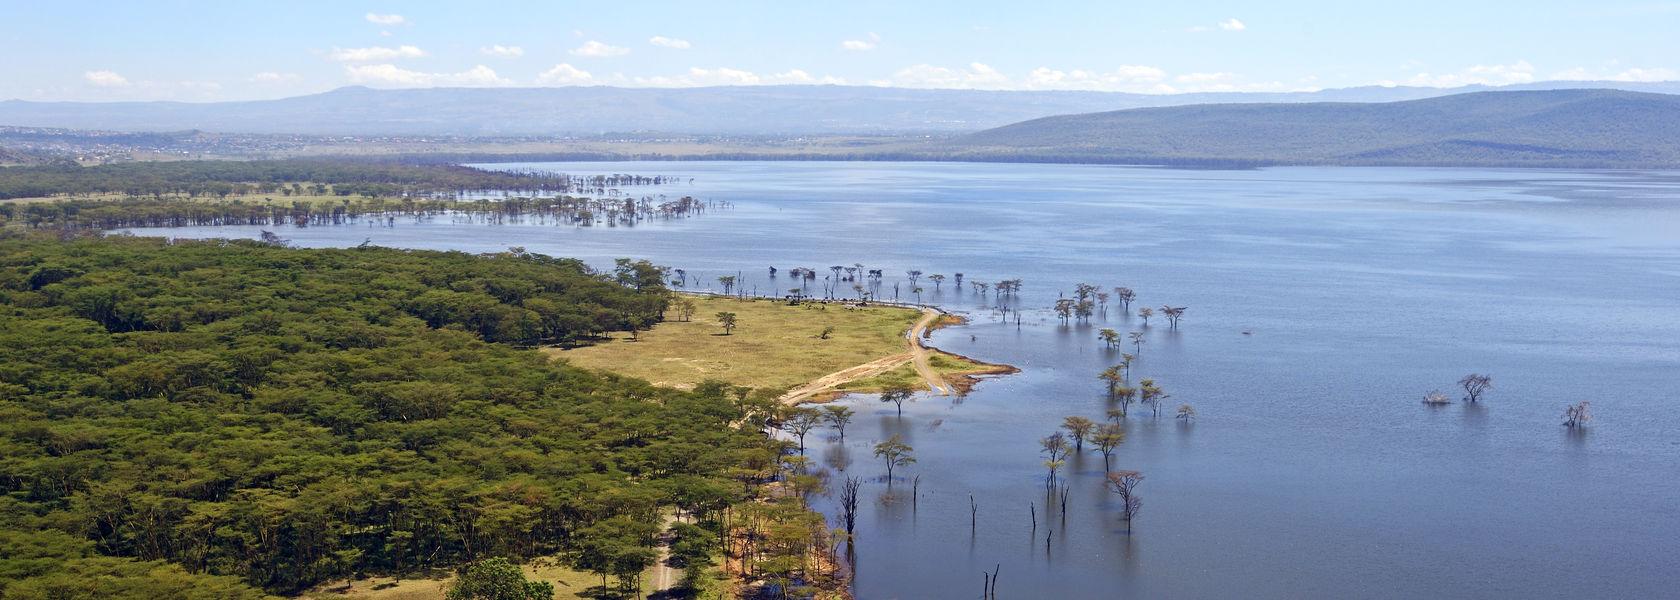 Lake Nakuru National Park - Bezoek Nakurumeer | Matoke Tours